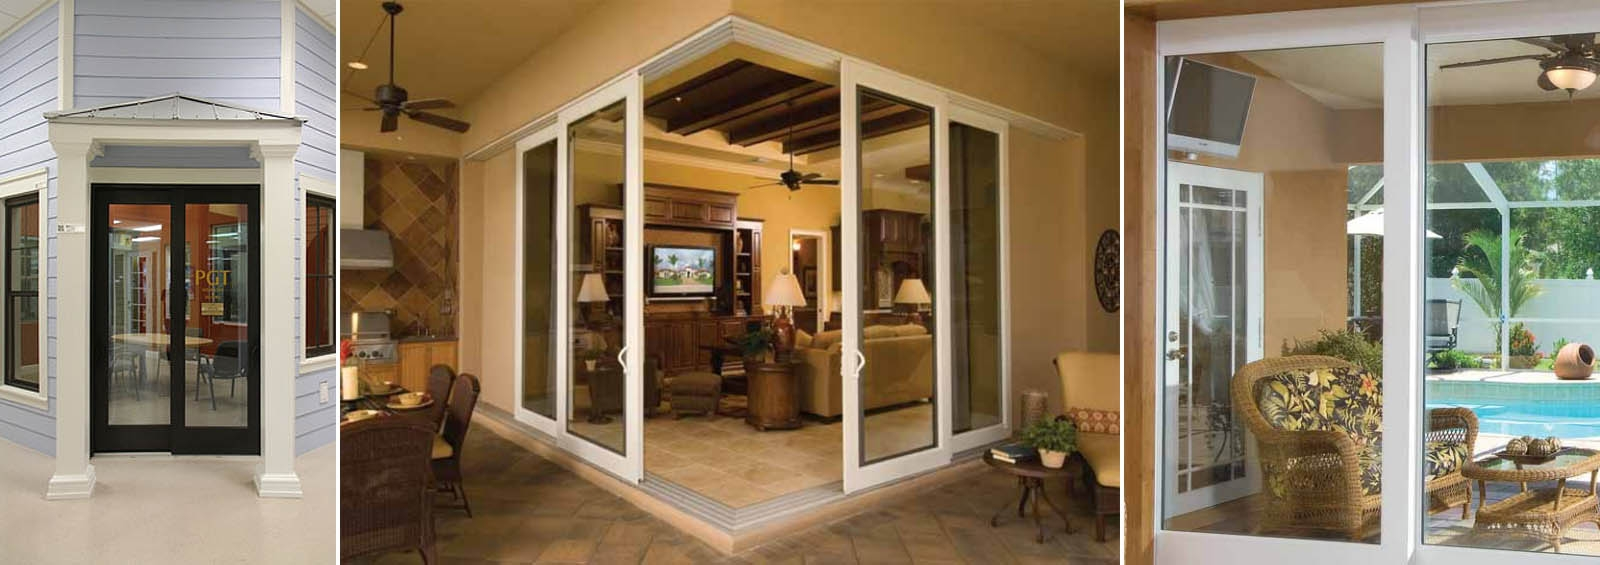 Pgt Sliding Glass Doorssarasota bradenton pgt swing doors dealer installer florida